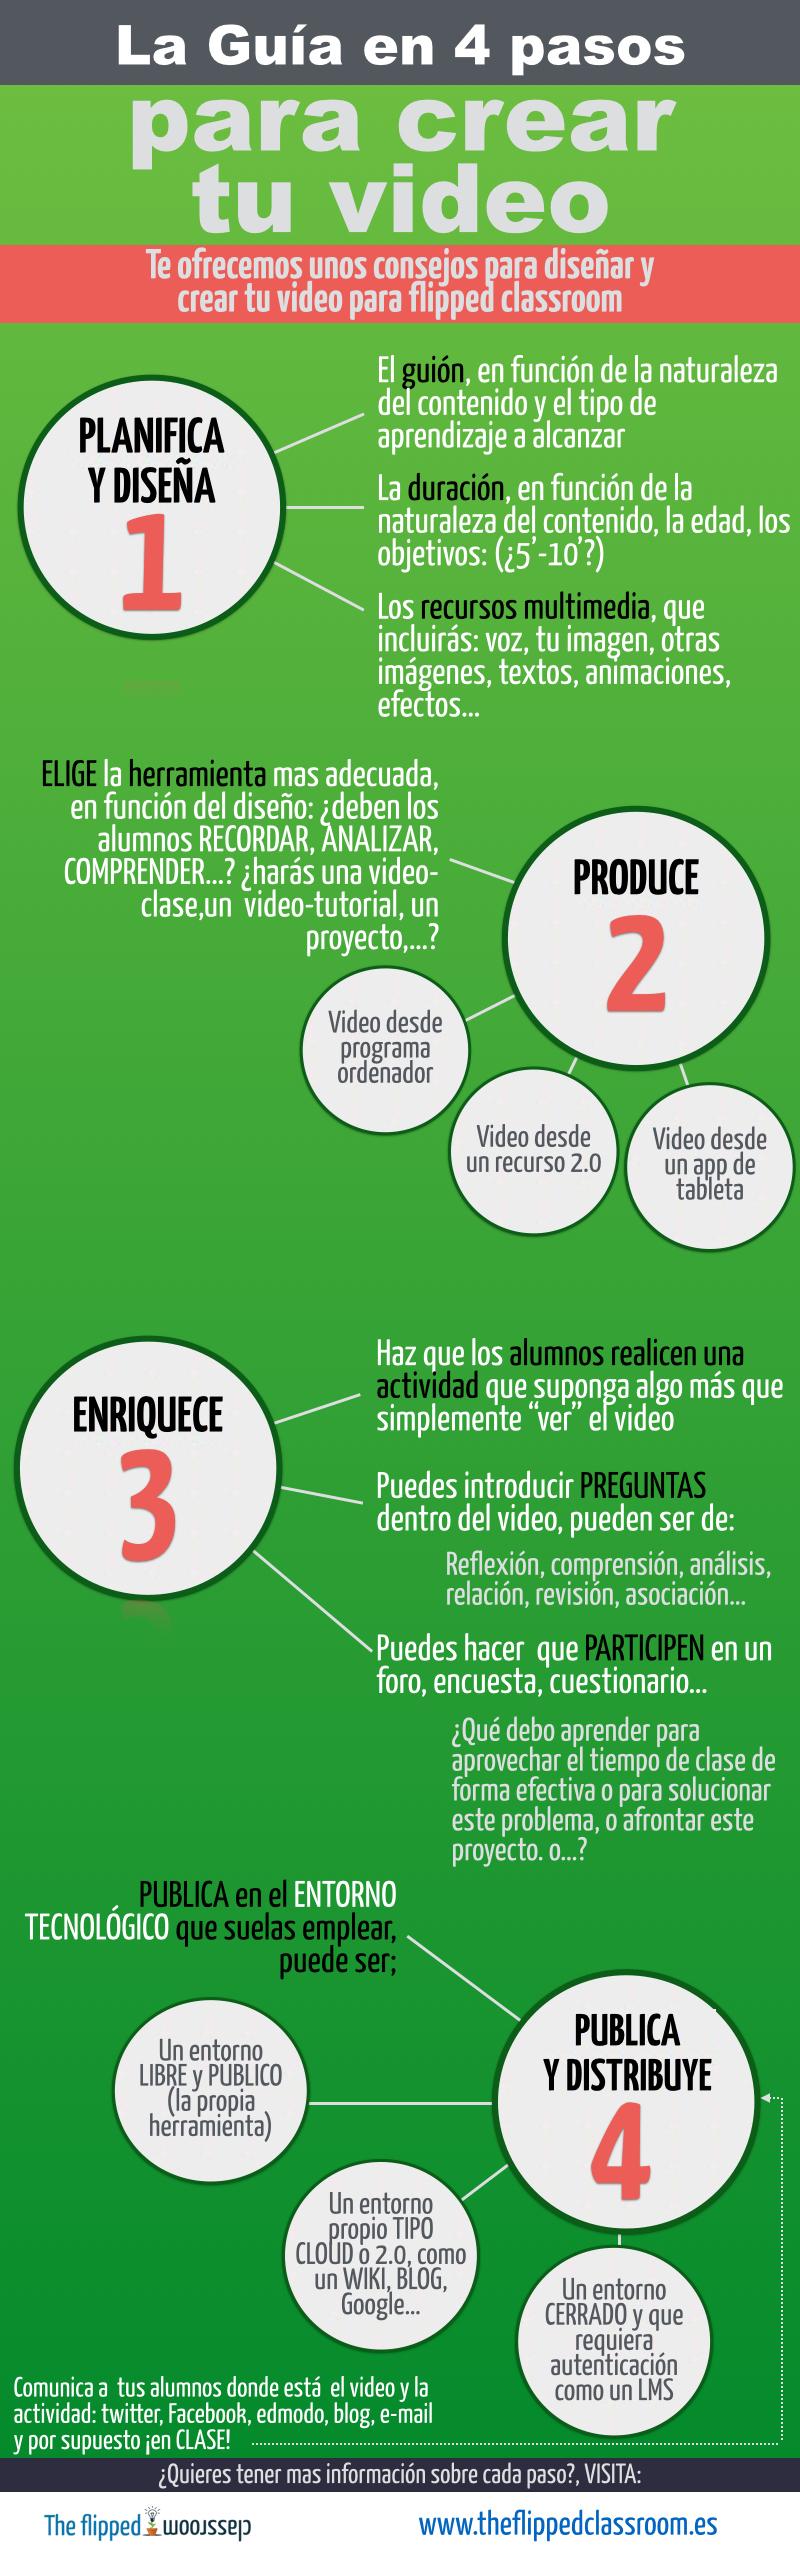 video-flipped-4-pasos-infografia